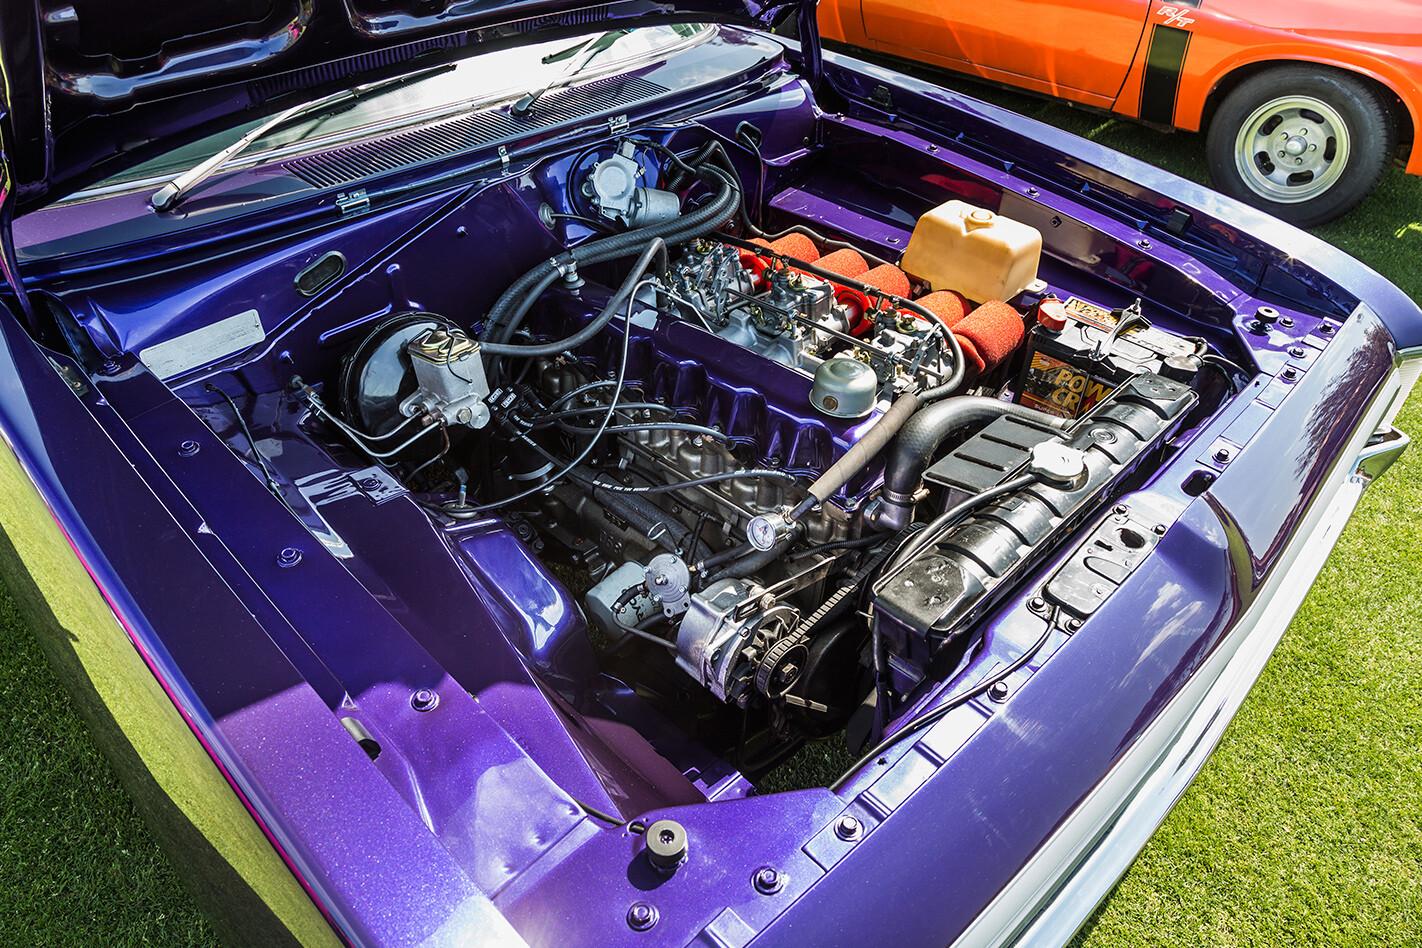 Chrysler Charger engine bay